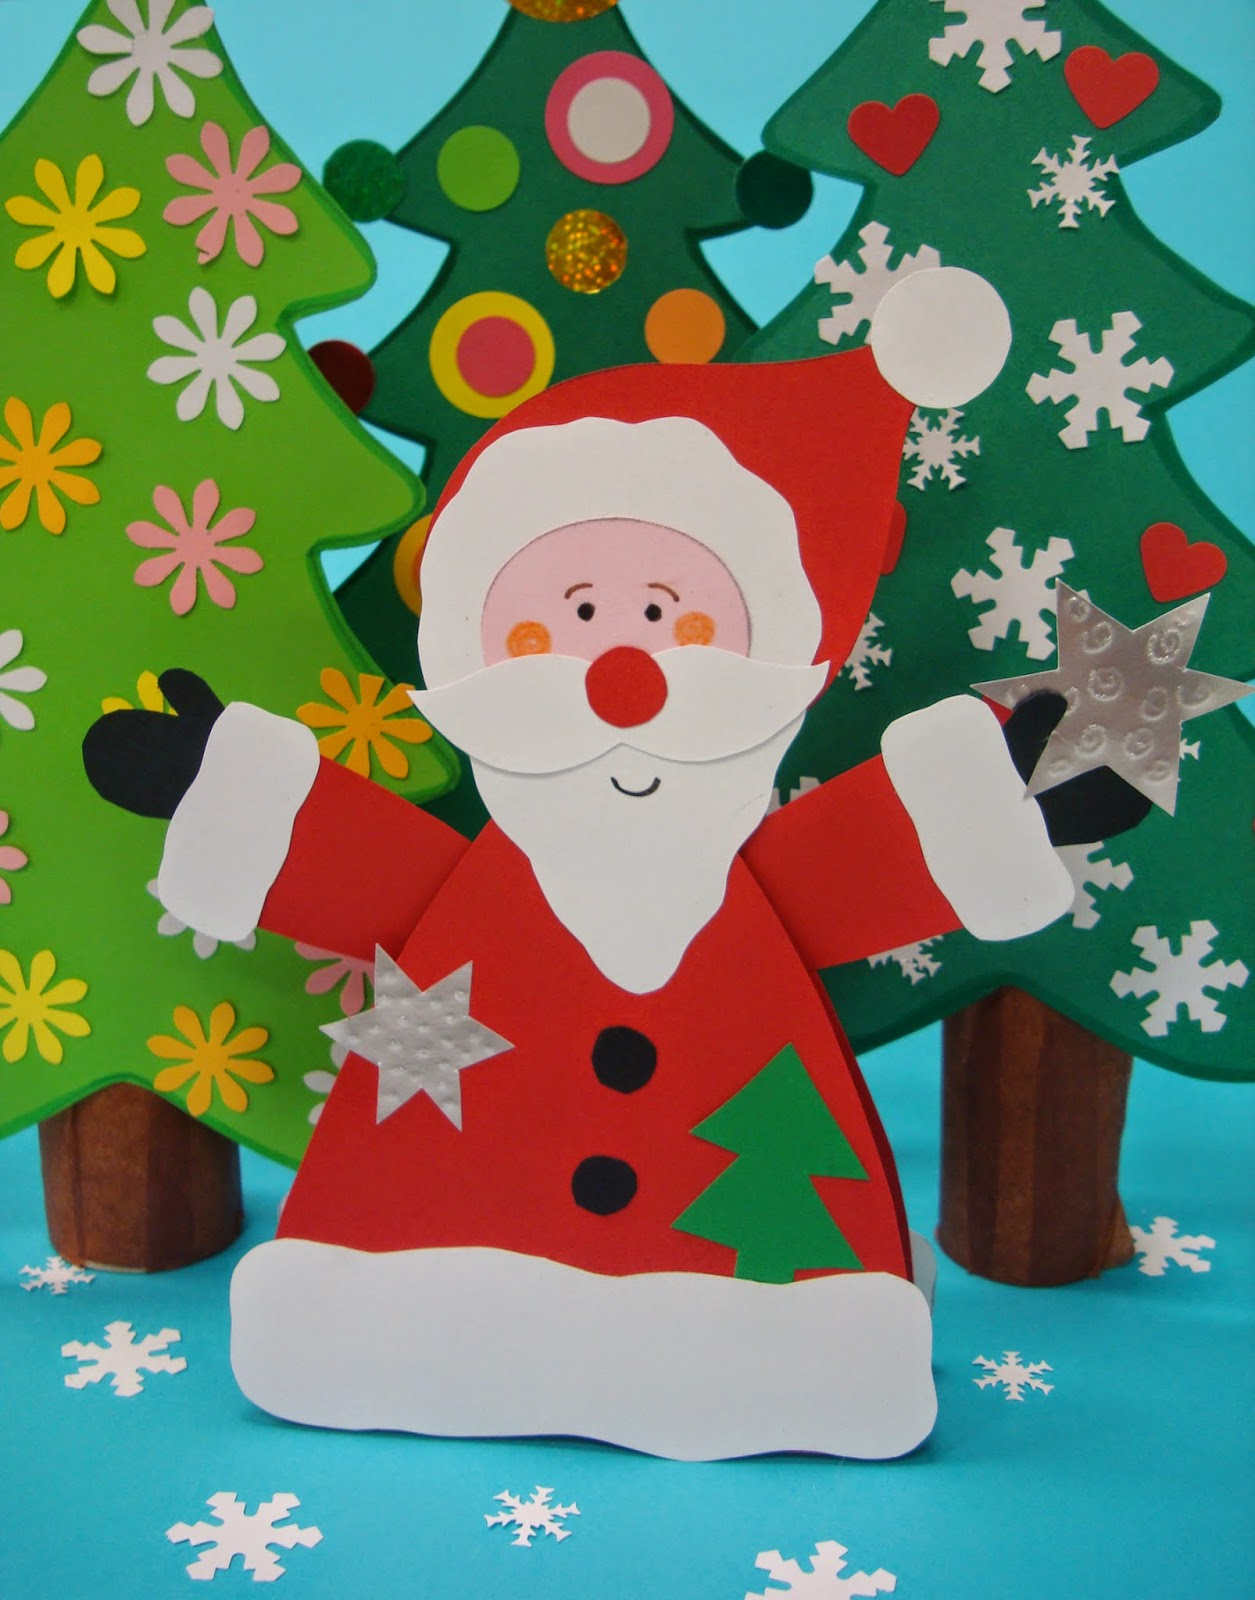 Vicky de sus taller de manualidades navide as para ni os - Manualidades navidenas faciles para ninos ...